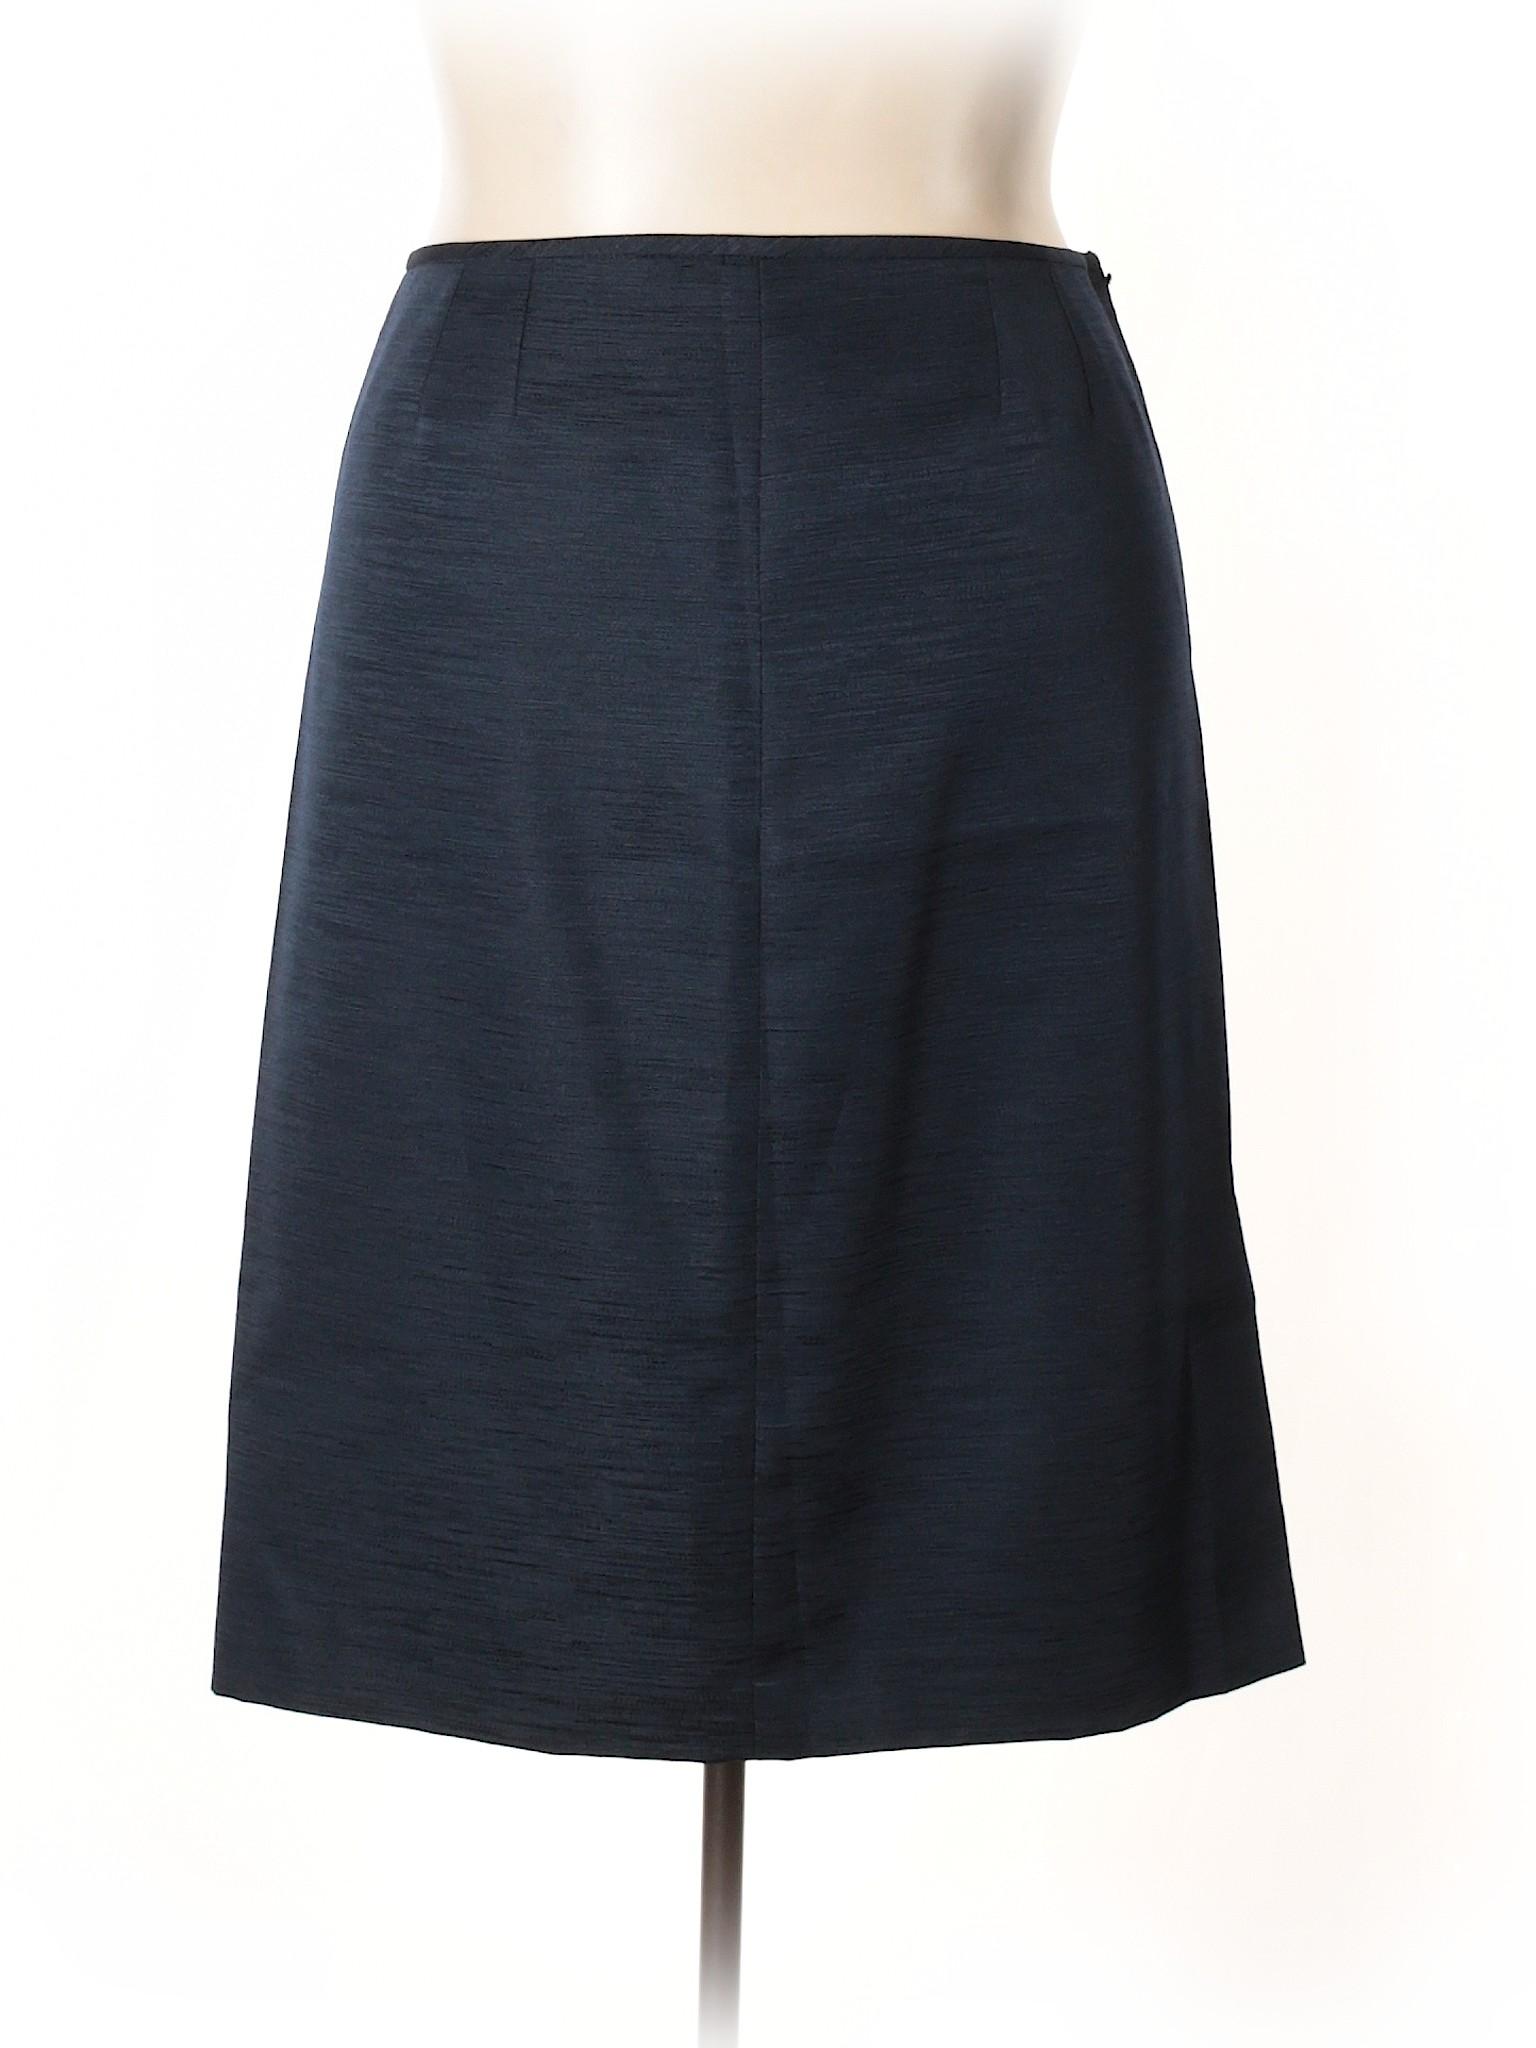 Skirt winter Leisure Evan Picone Casual IRxAqWBOw